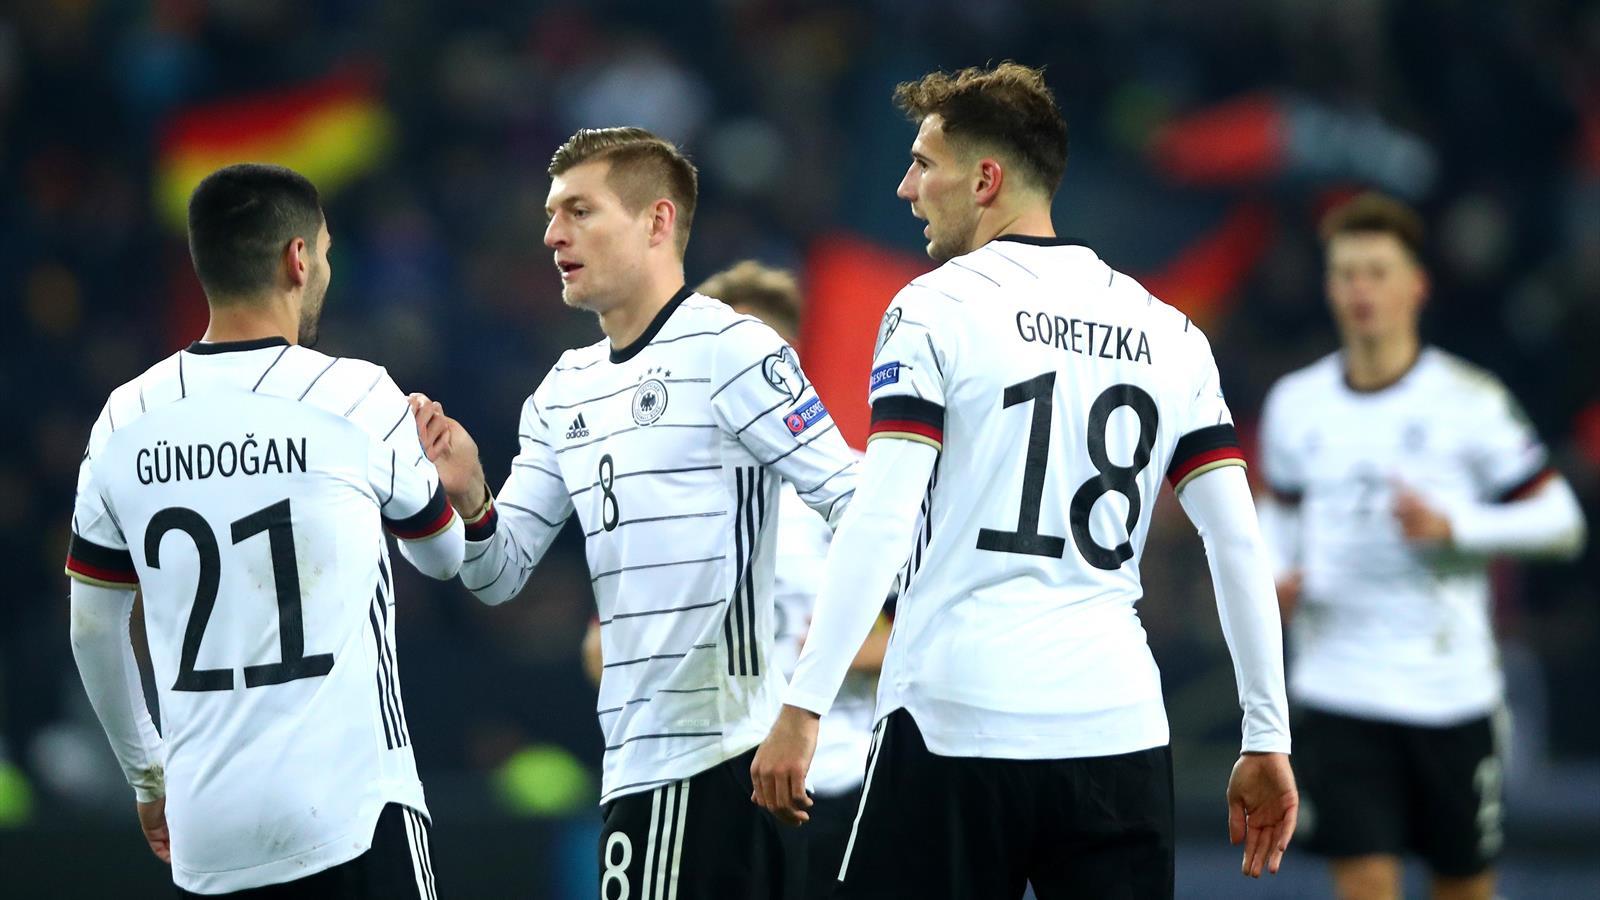 Germania-Bielorussia 4-0: Ginter, Goretzka, doppio Kroos e ...